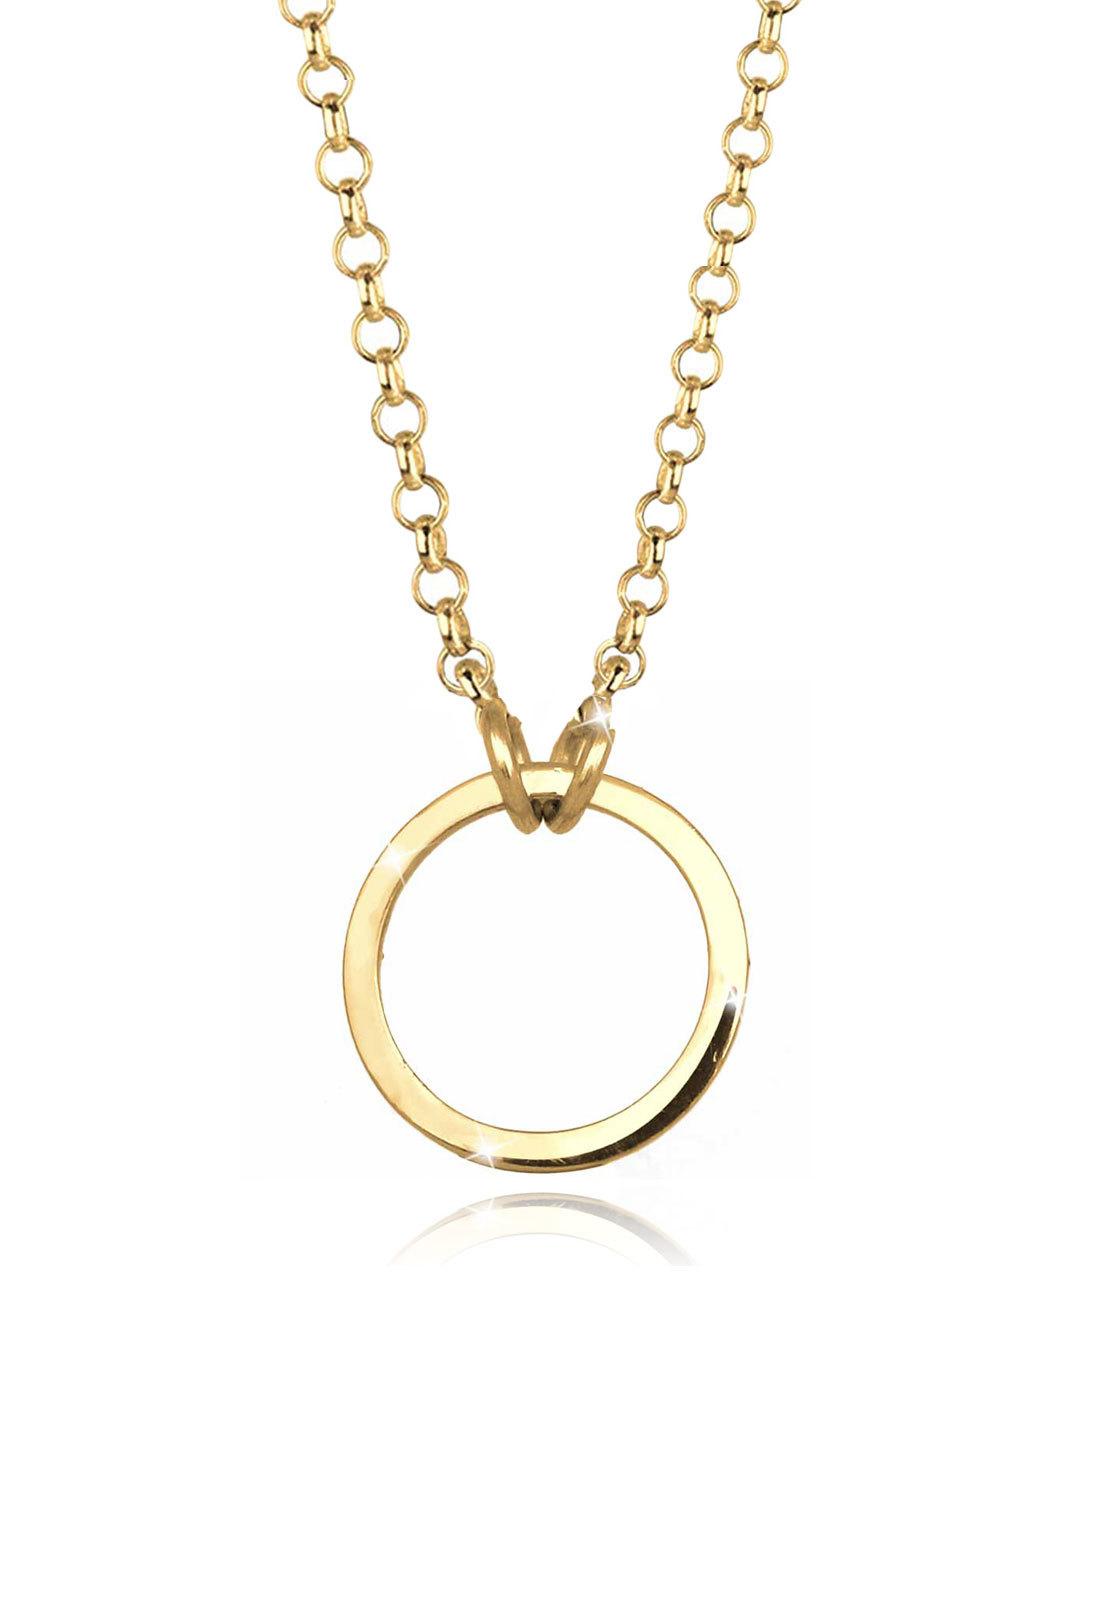 Charmträger | 925 Sterling Silber vergoldet